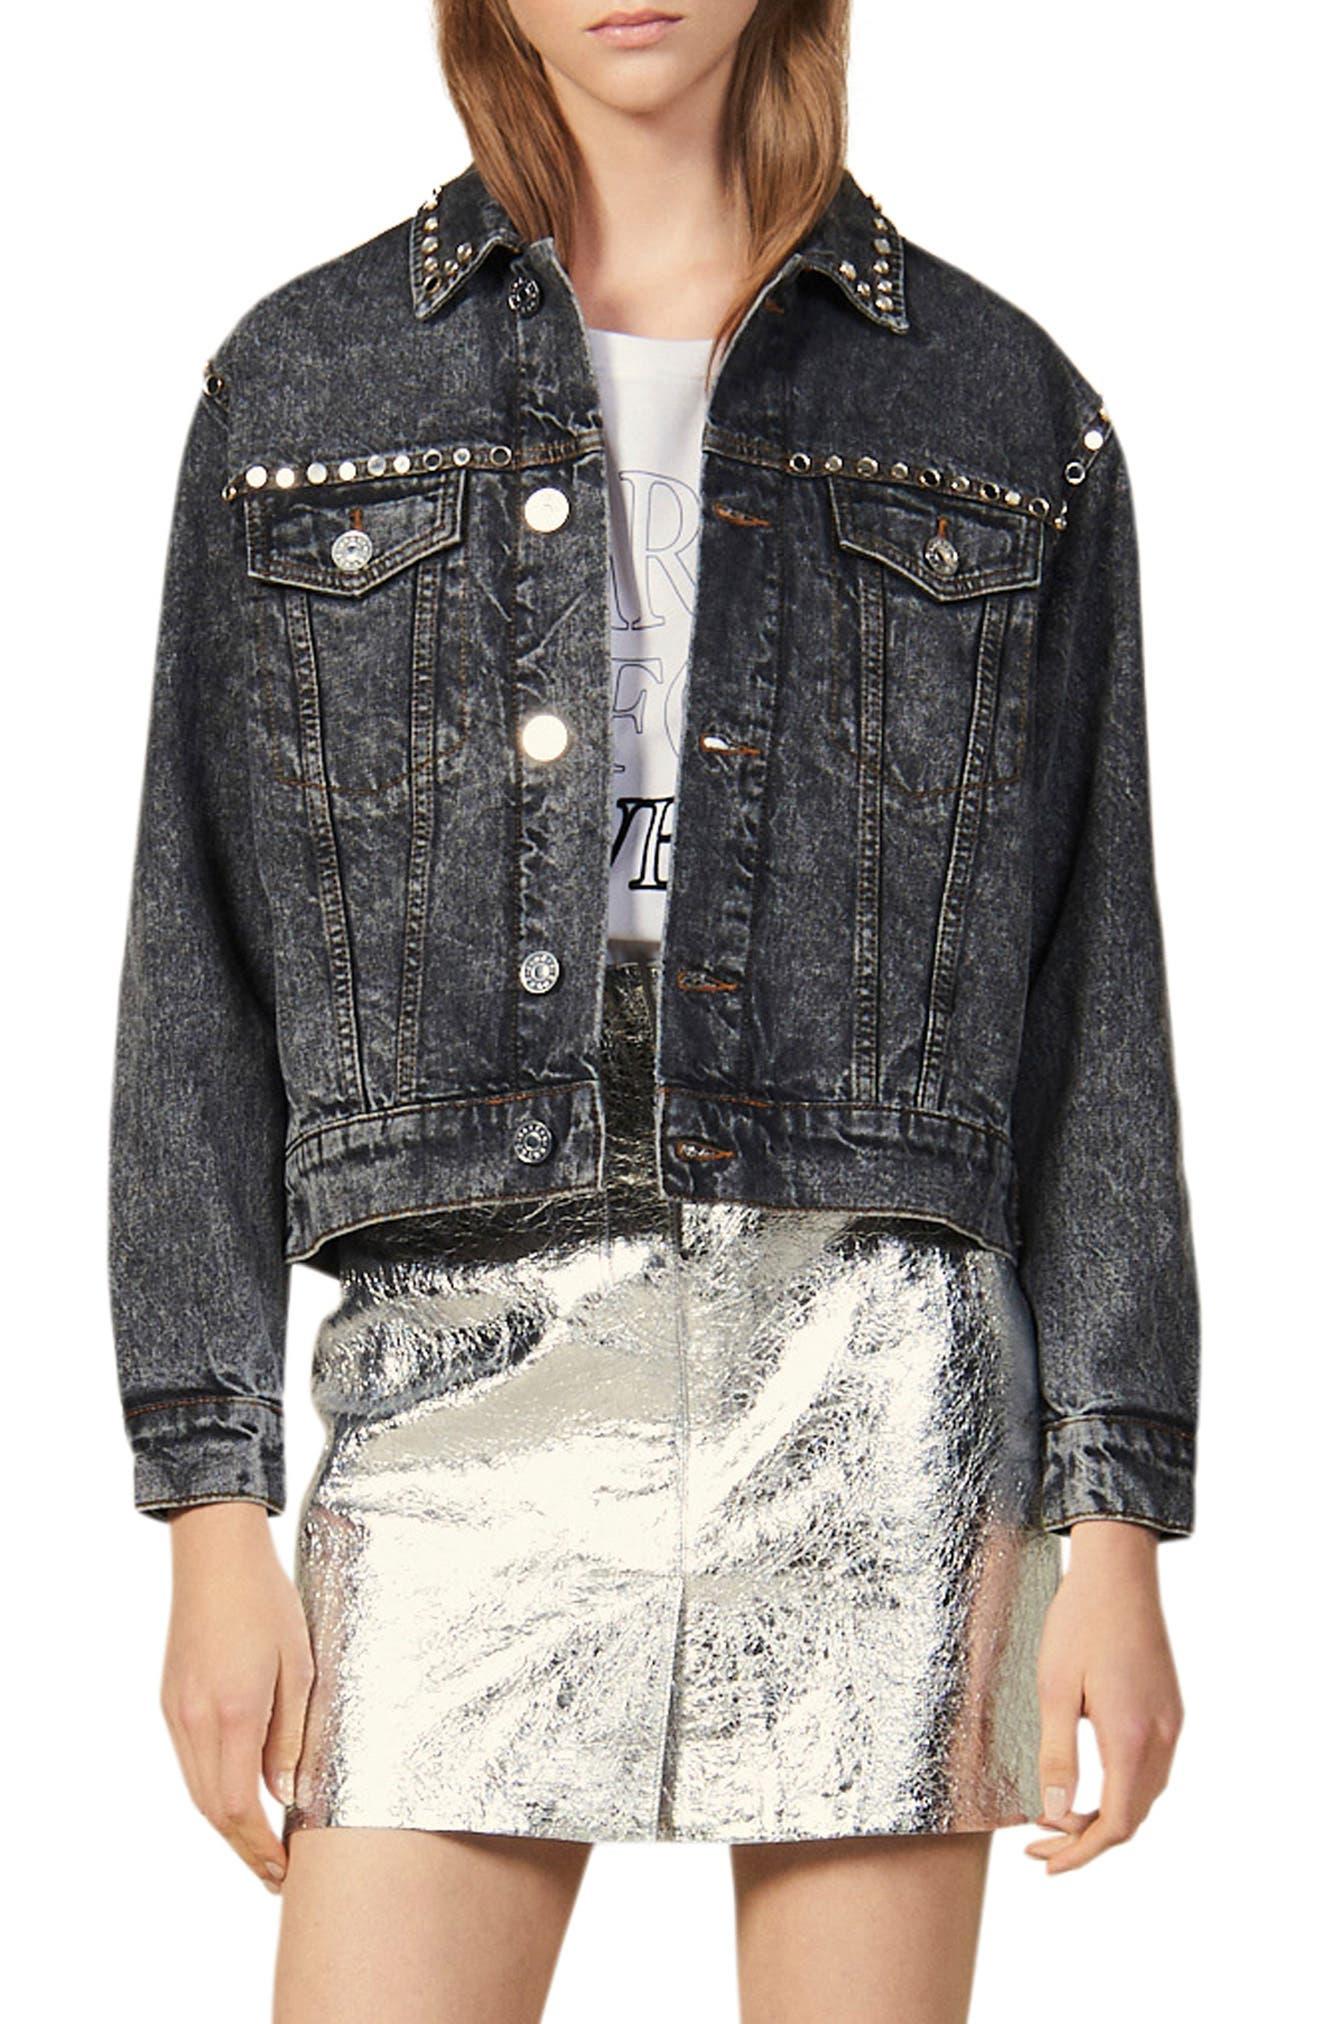 Ambre Mirrored Stud Denim Jacket by Sandro